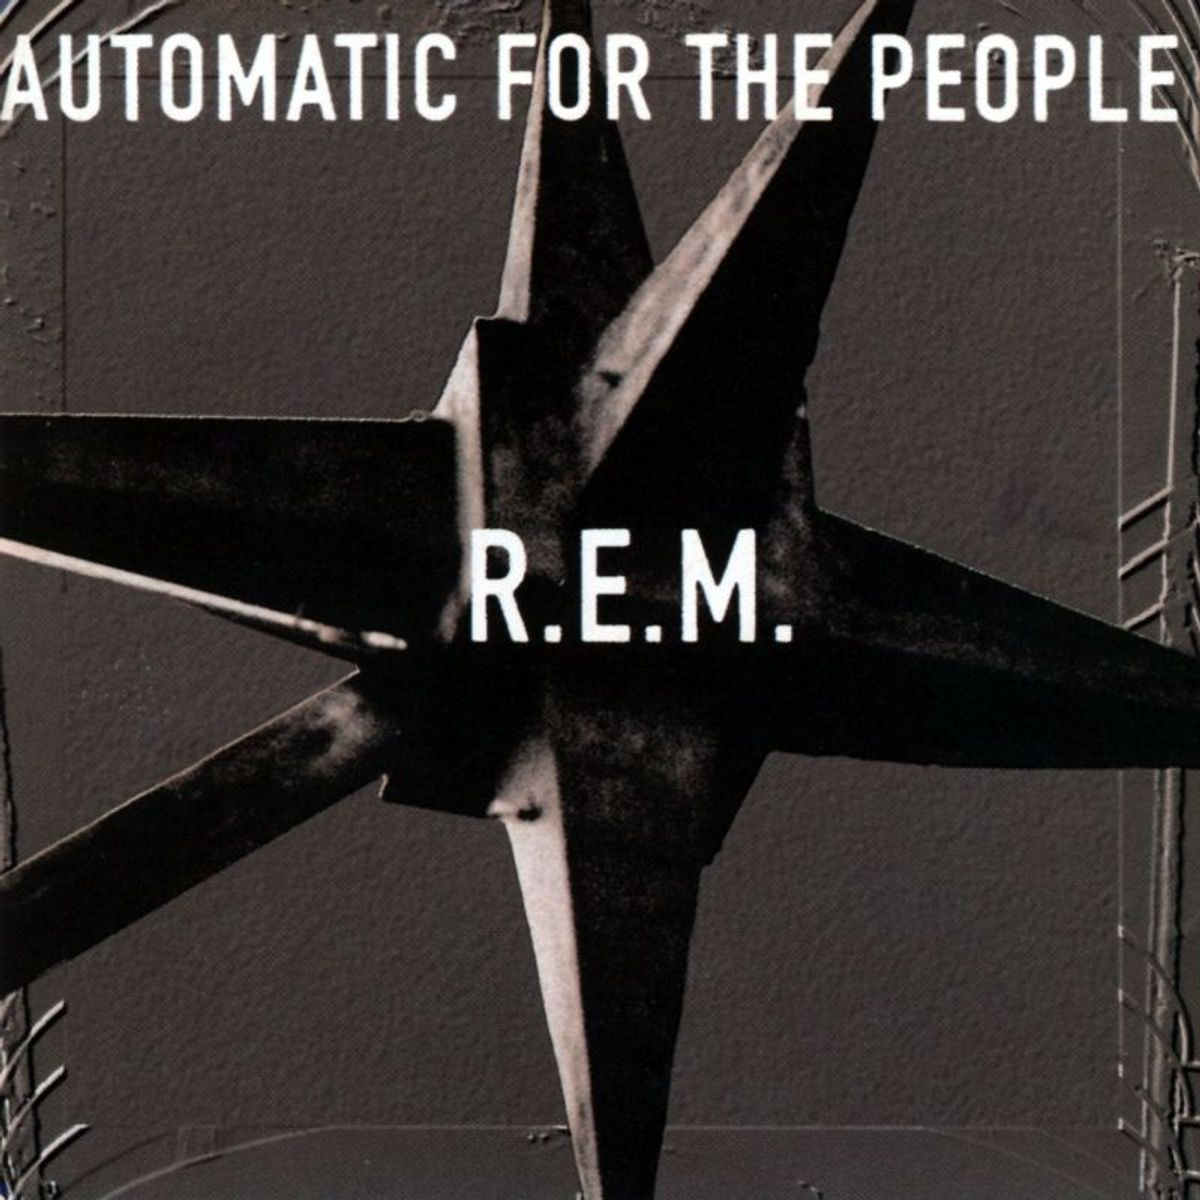 #NewOrleans - R.E.M. - New Orleans Instrumental No 1 (1992)